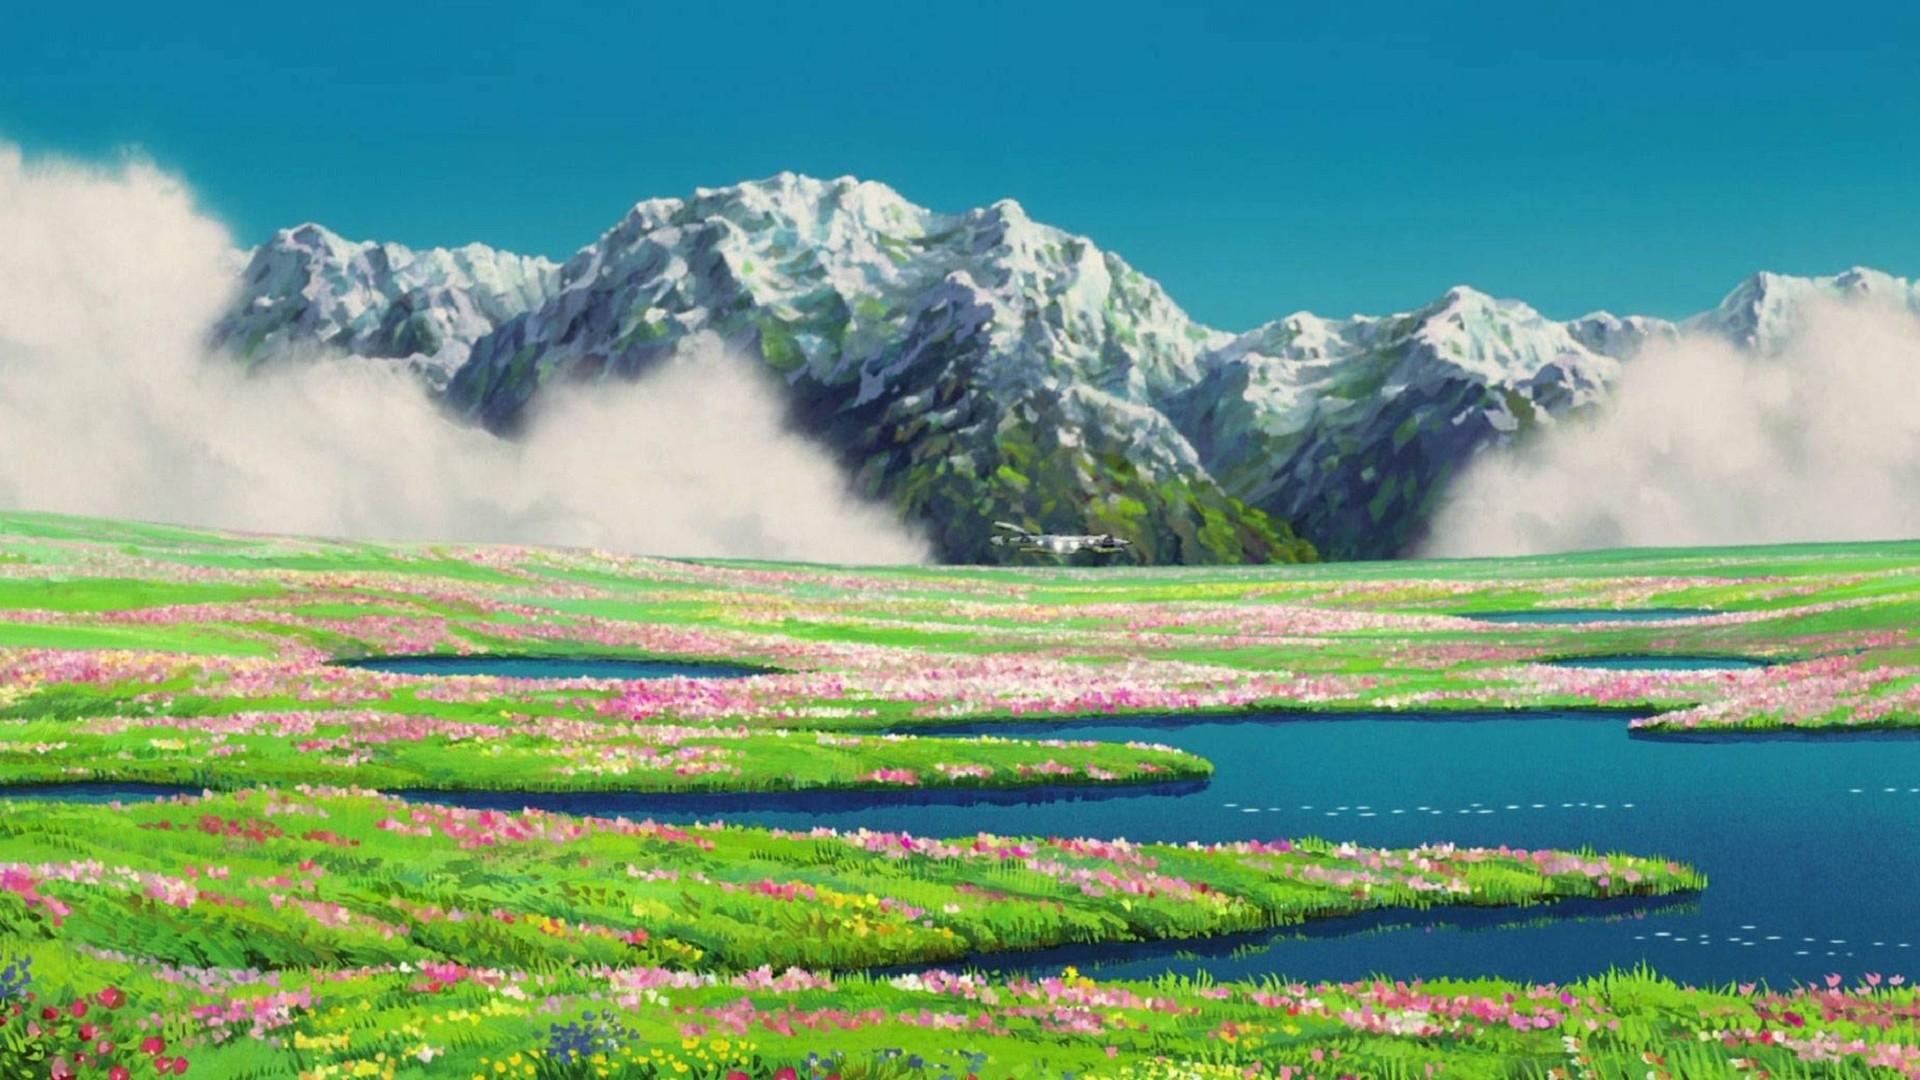 1920x1080 Studio Ghibli Wallpapers